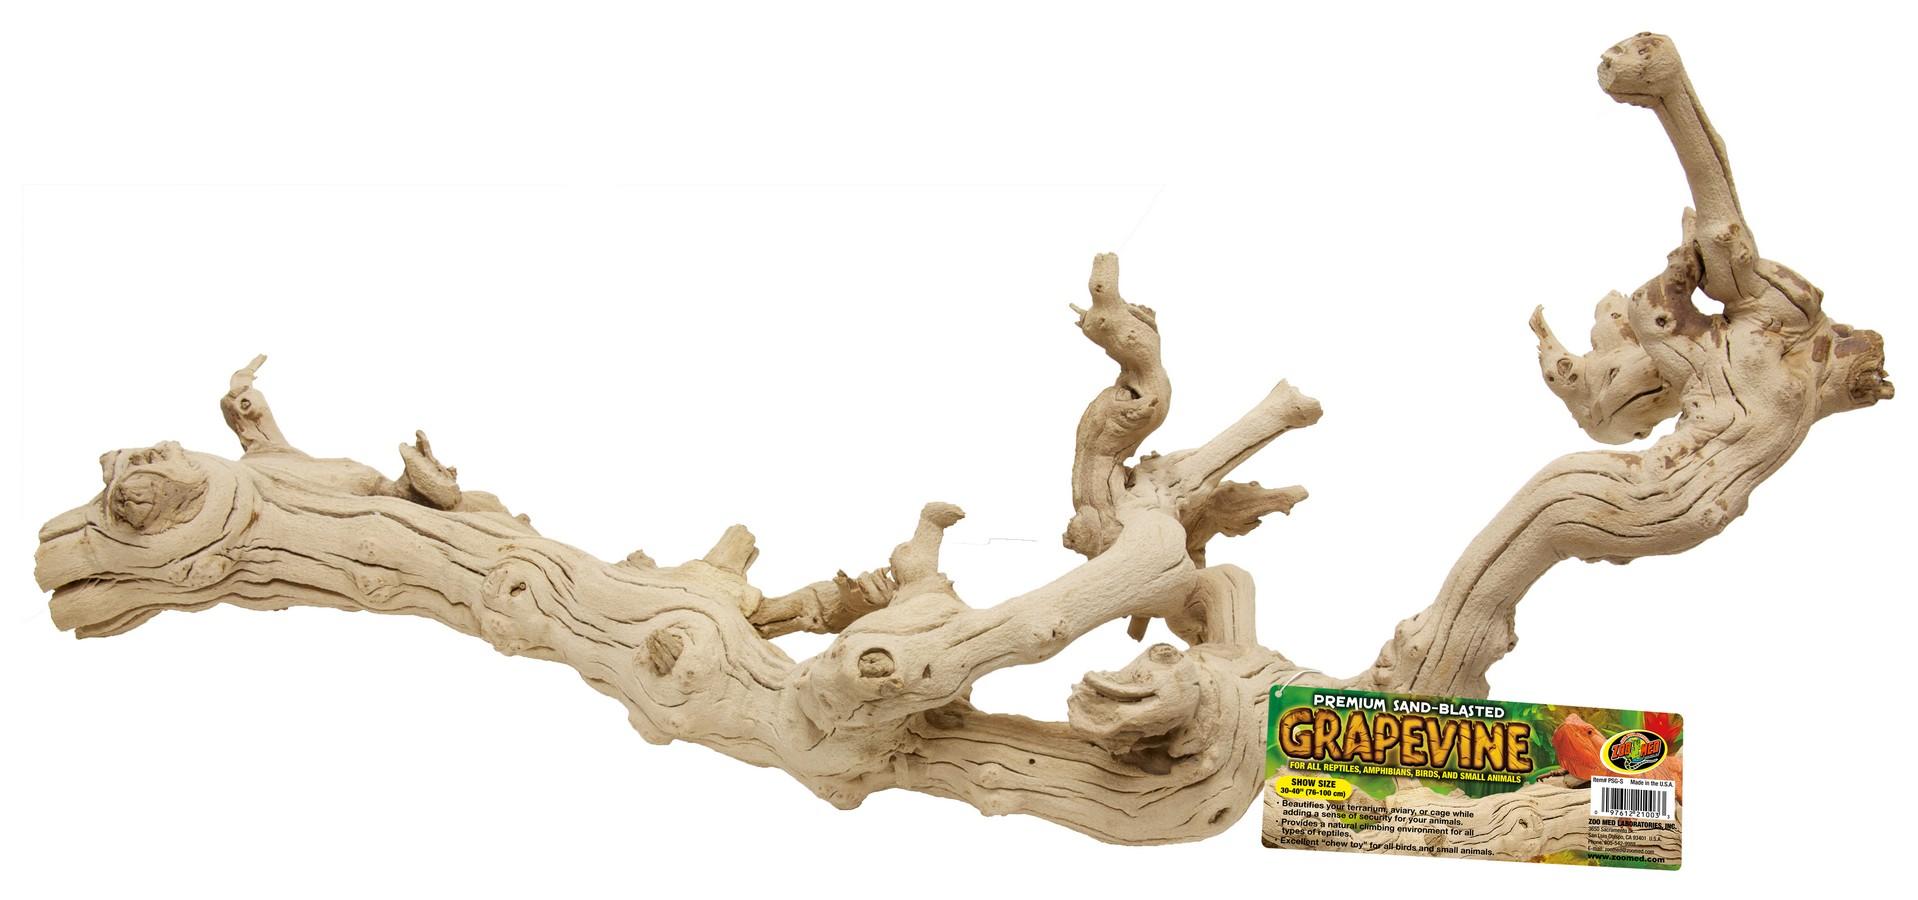 Premium Sand Blasted Grapevine Zoo Med Laboratories Inc